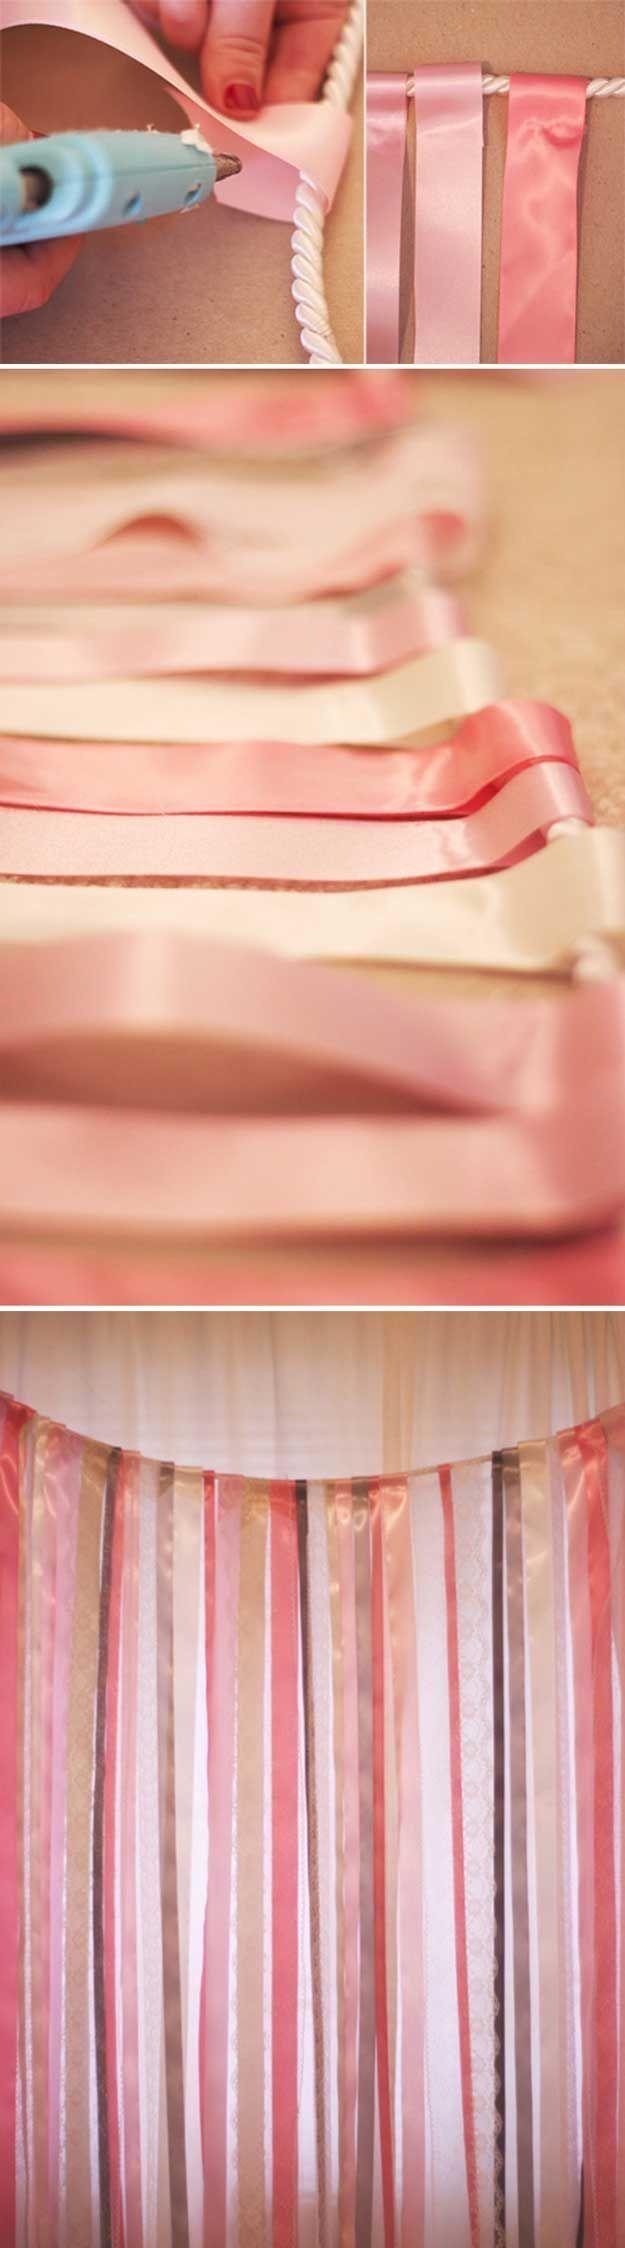 2 ton küchenideen  best ribbon laces fitas images on pinterest  birthday